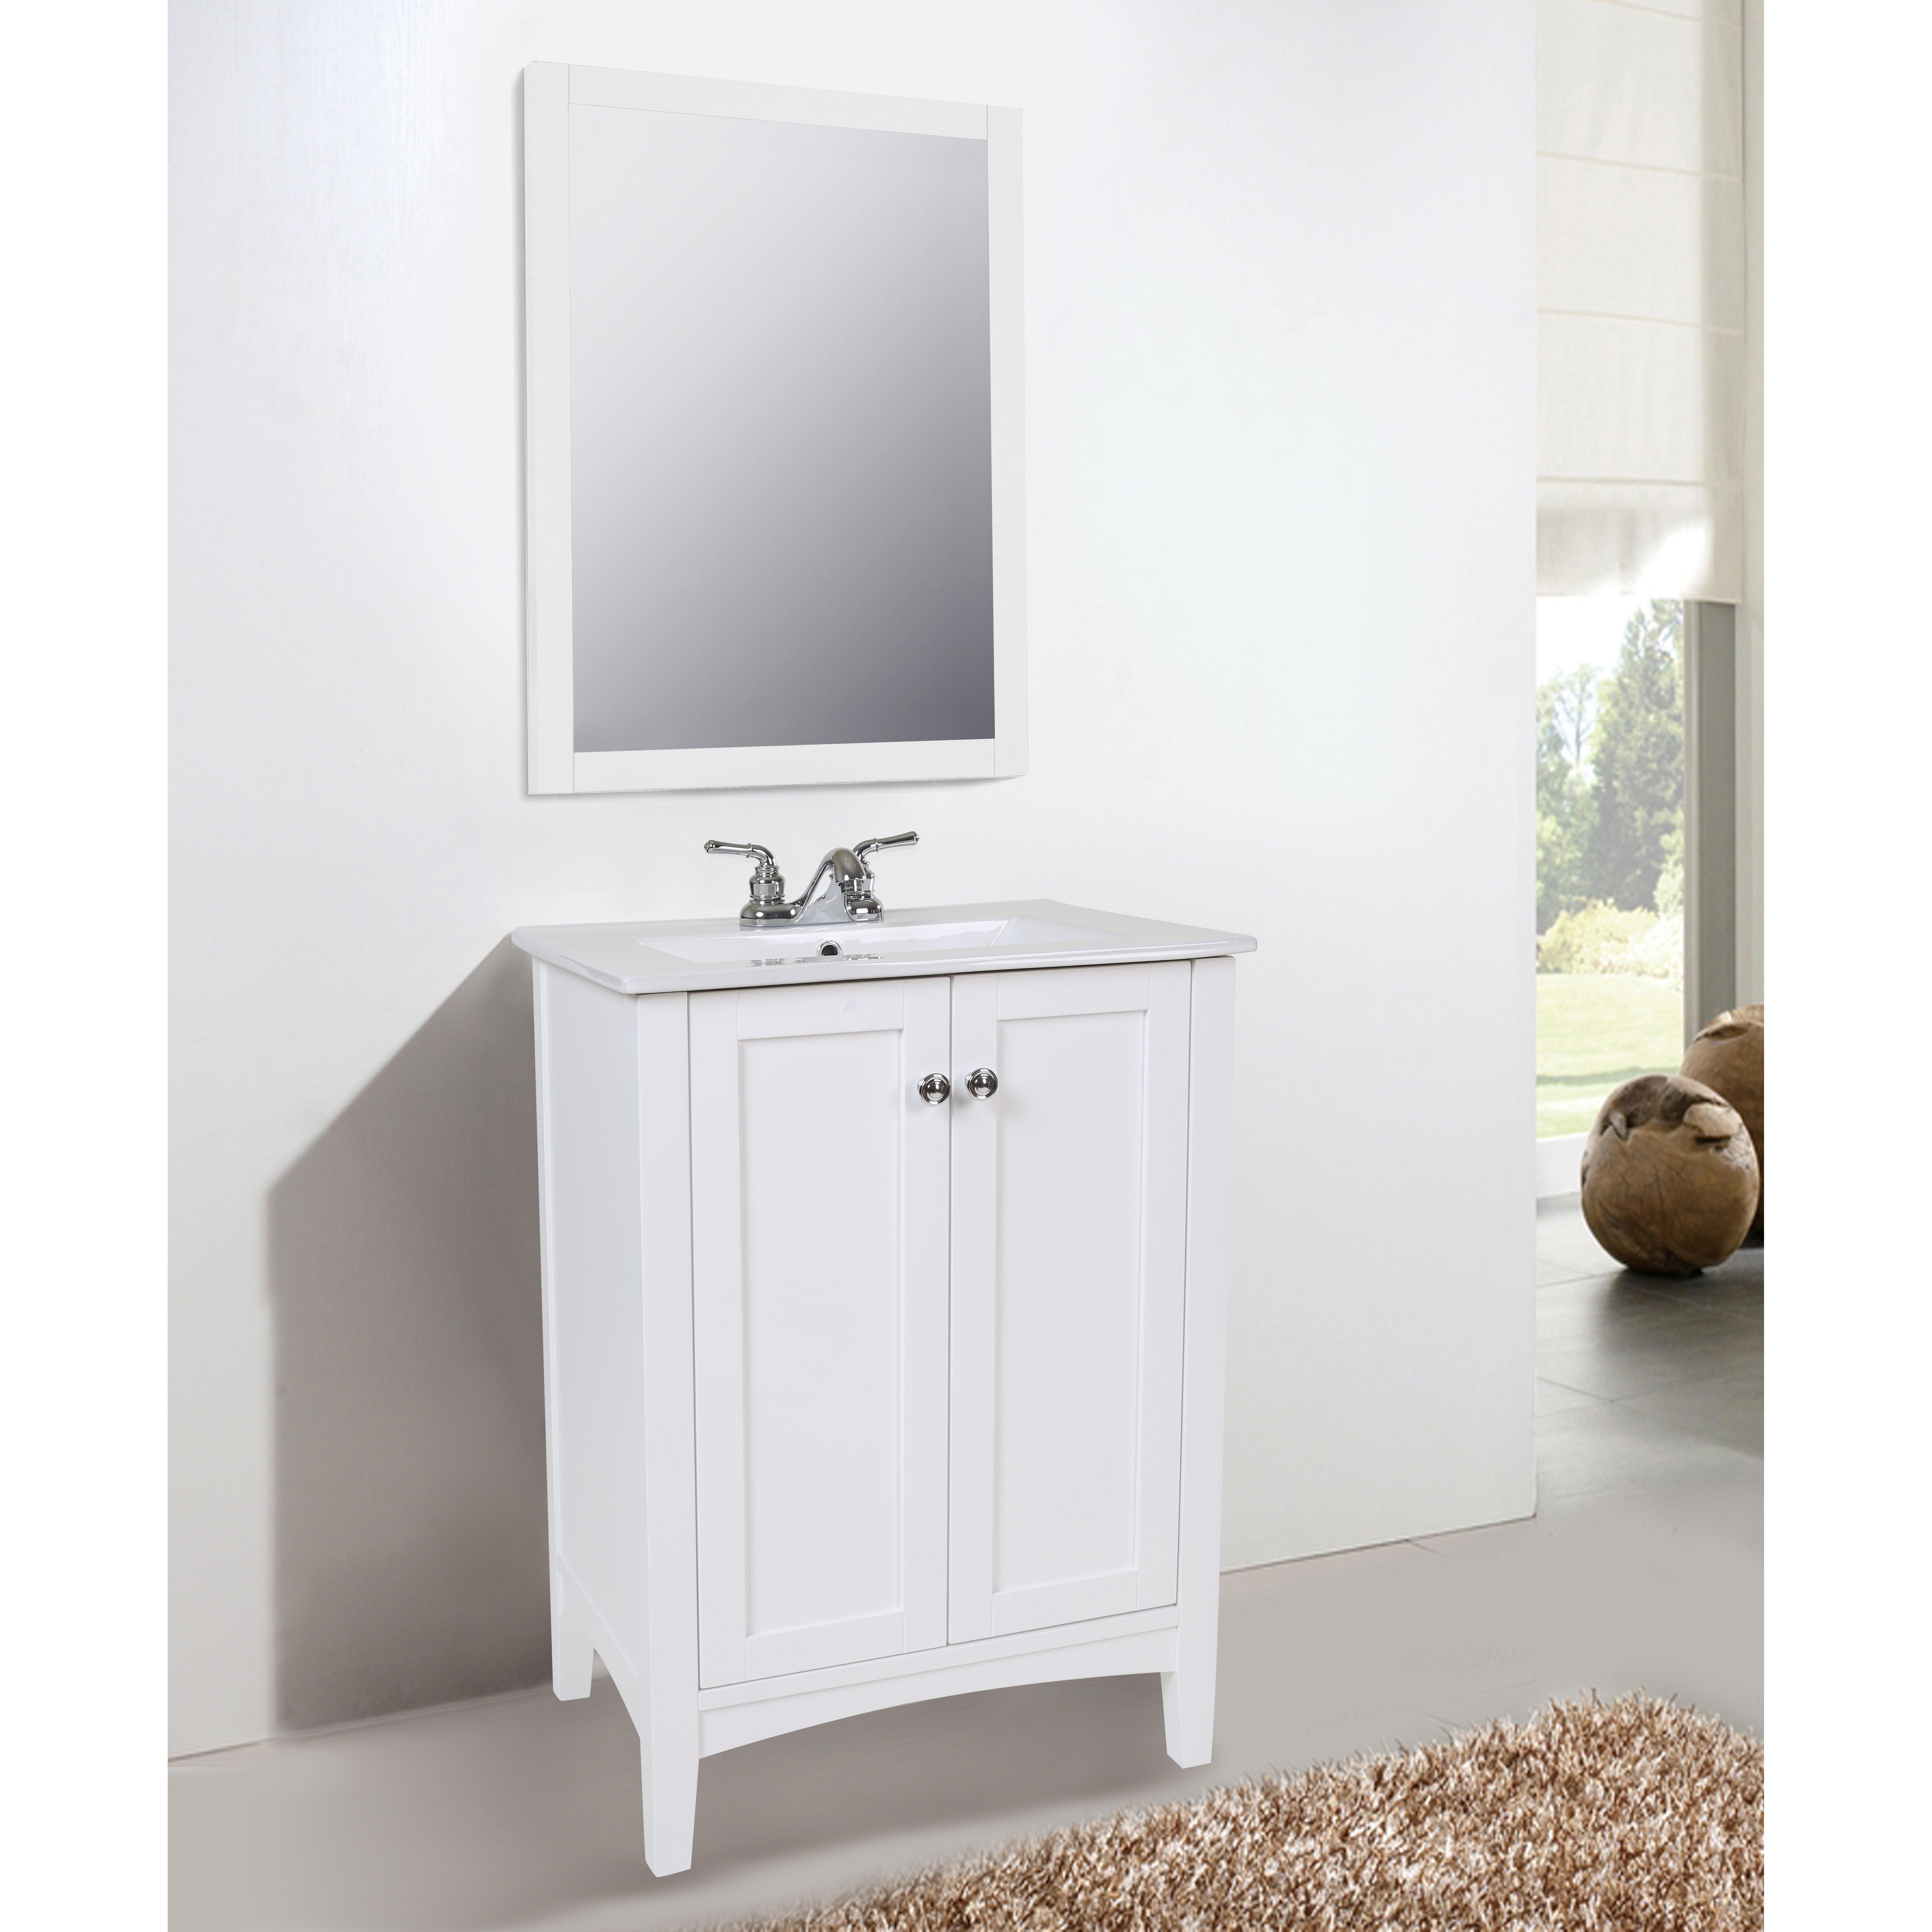 24 Bathroom Vanity With Drawers My Web Value